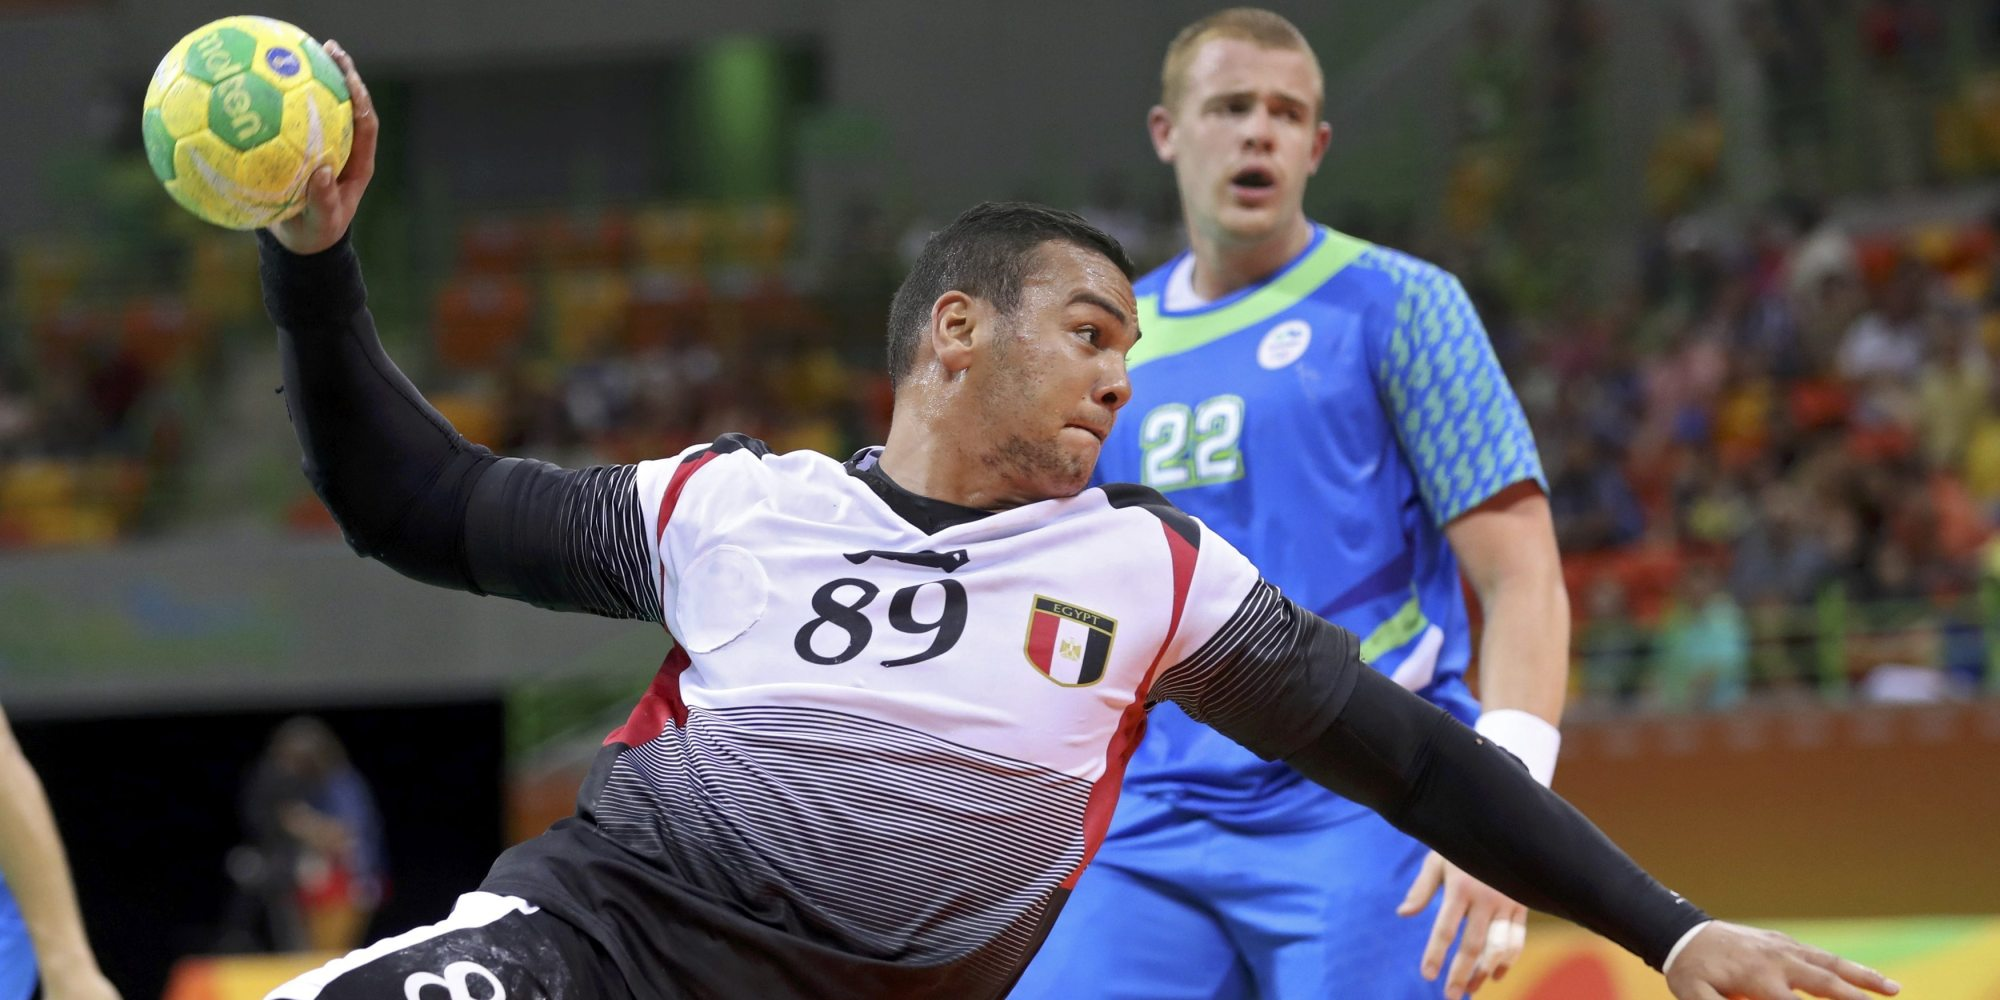 handball olympia livestream